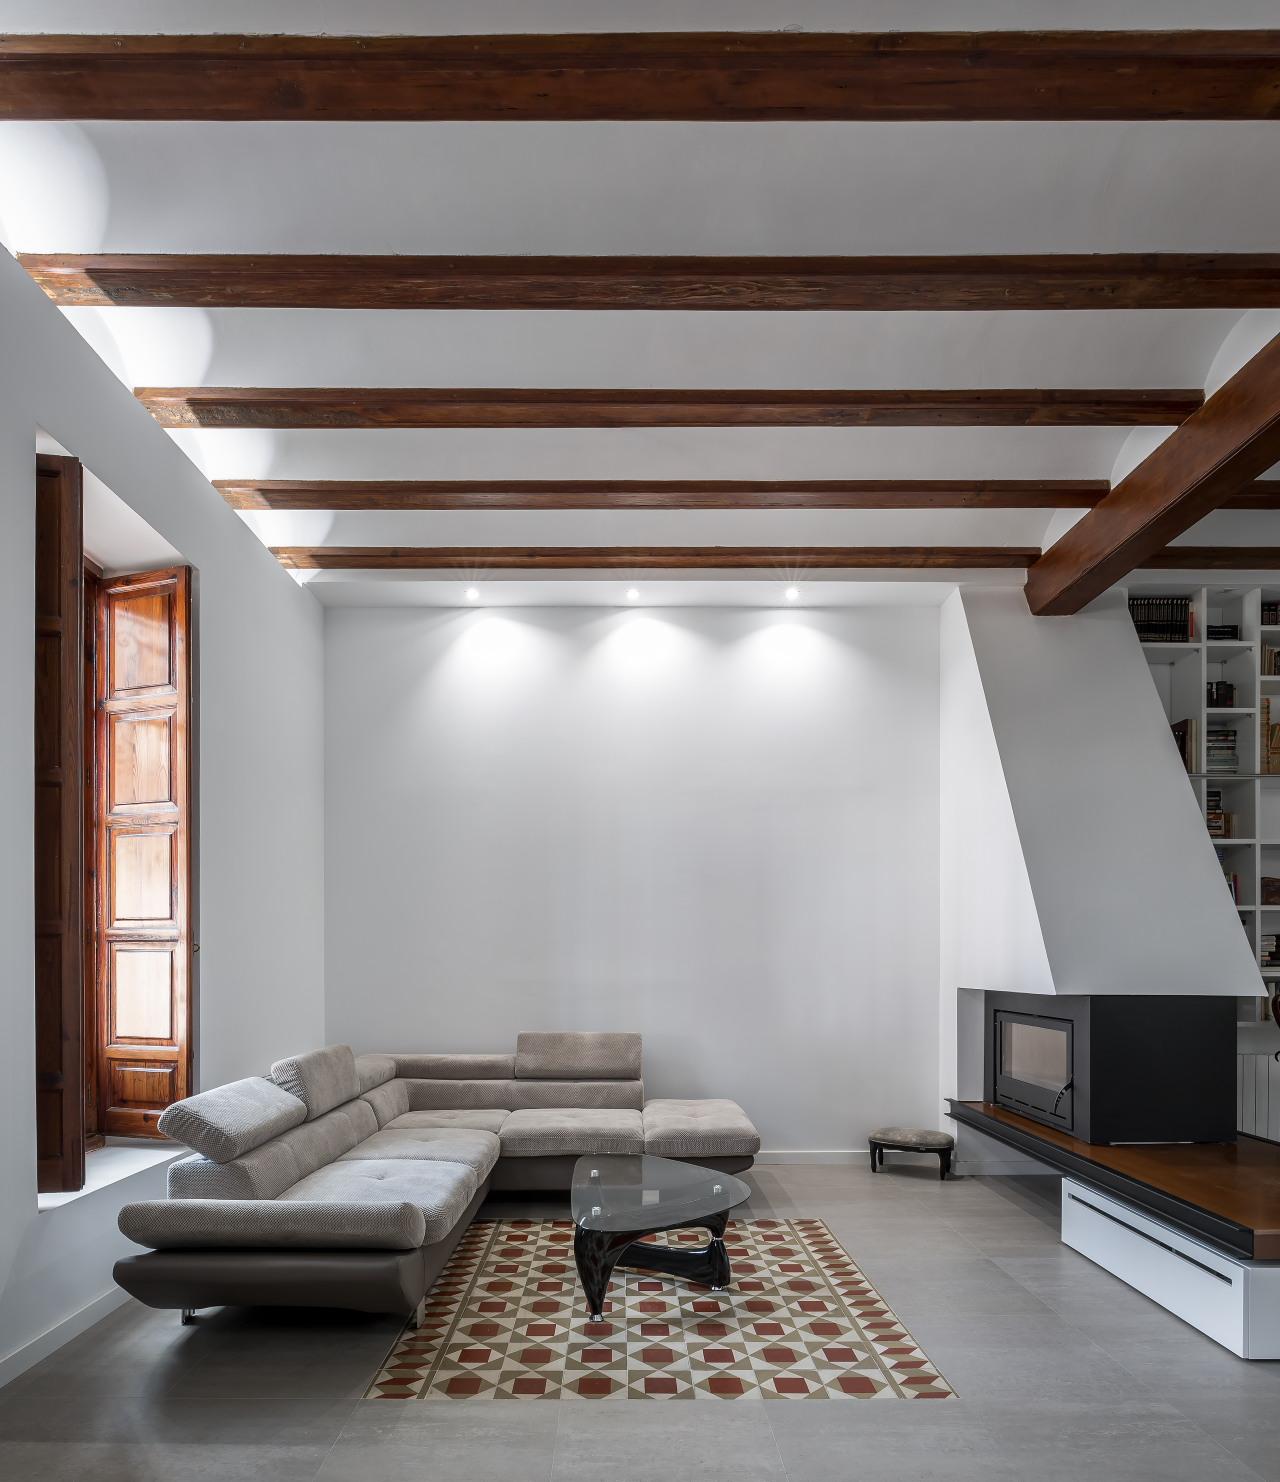 fotografia-arquitectura-valencia-german-cabo-viraje-rehabilitacion-campanar (32)